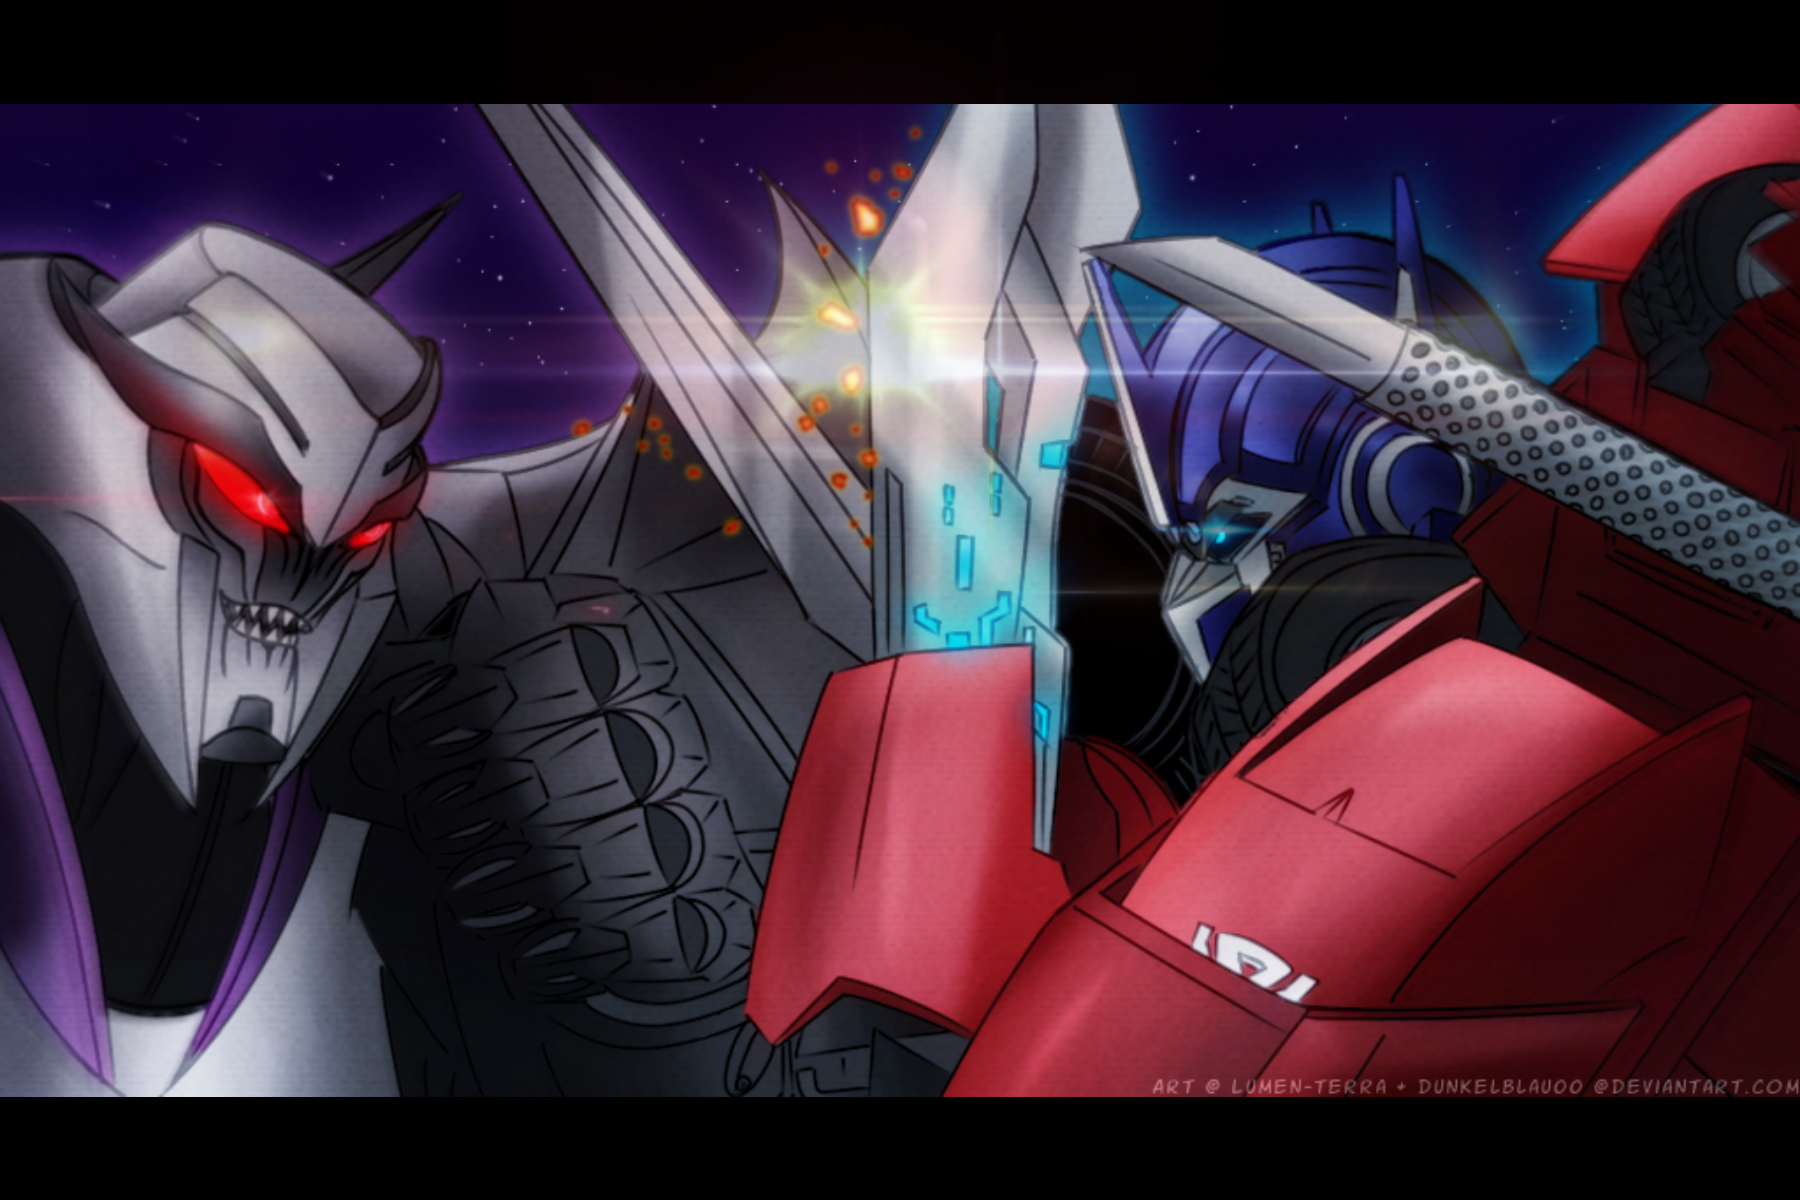 Optimus Vs Megatron ::Collab with dunkelblau:: by Lumen-Terra